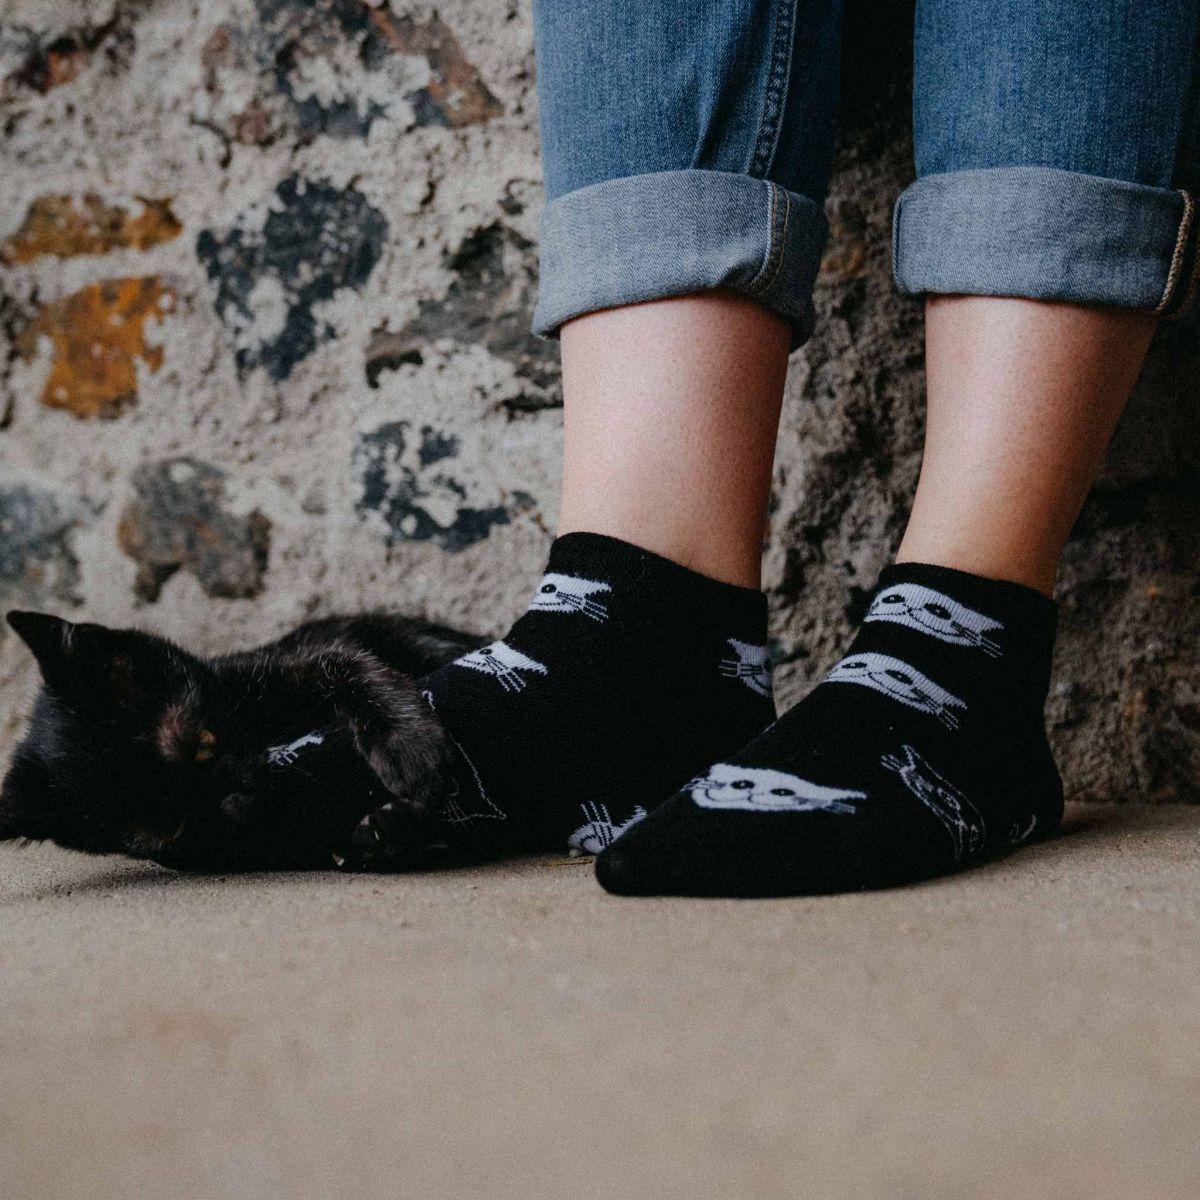 Ponožky - Mačky čierne - nízke p1